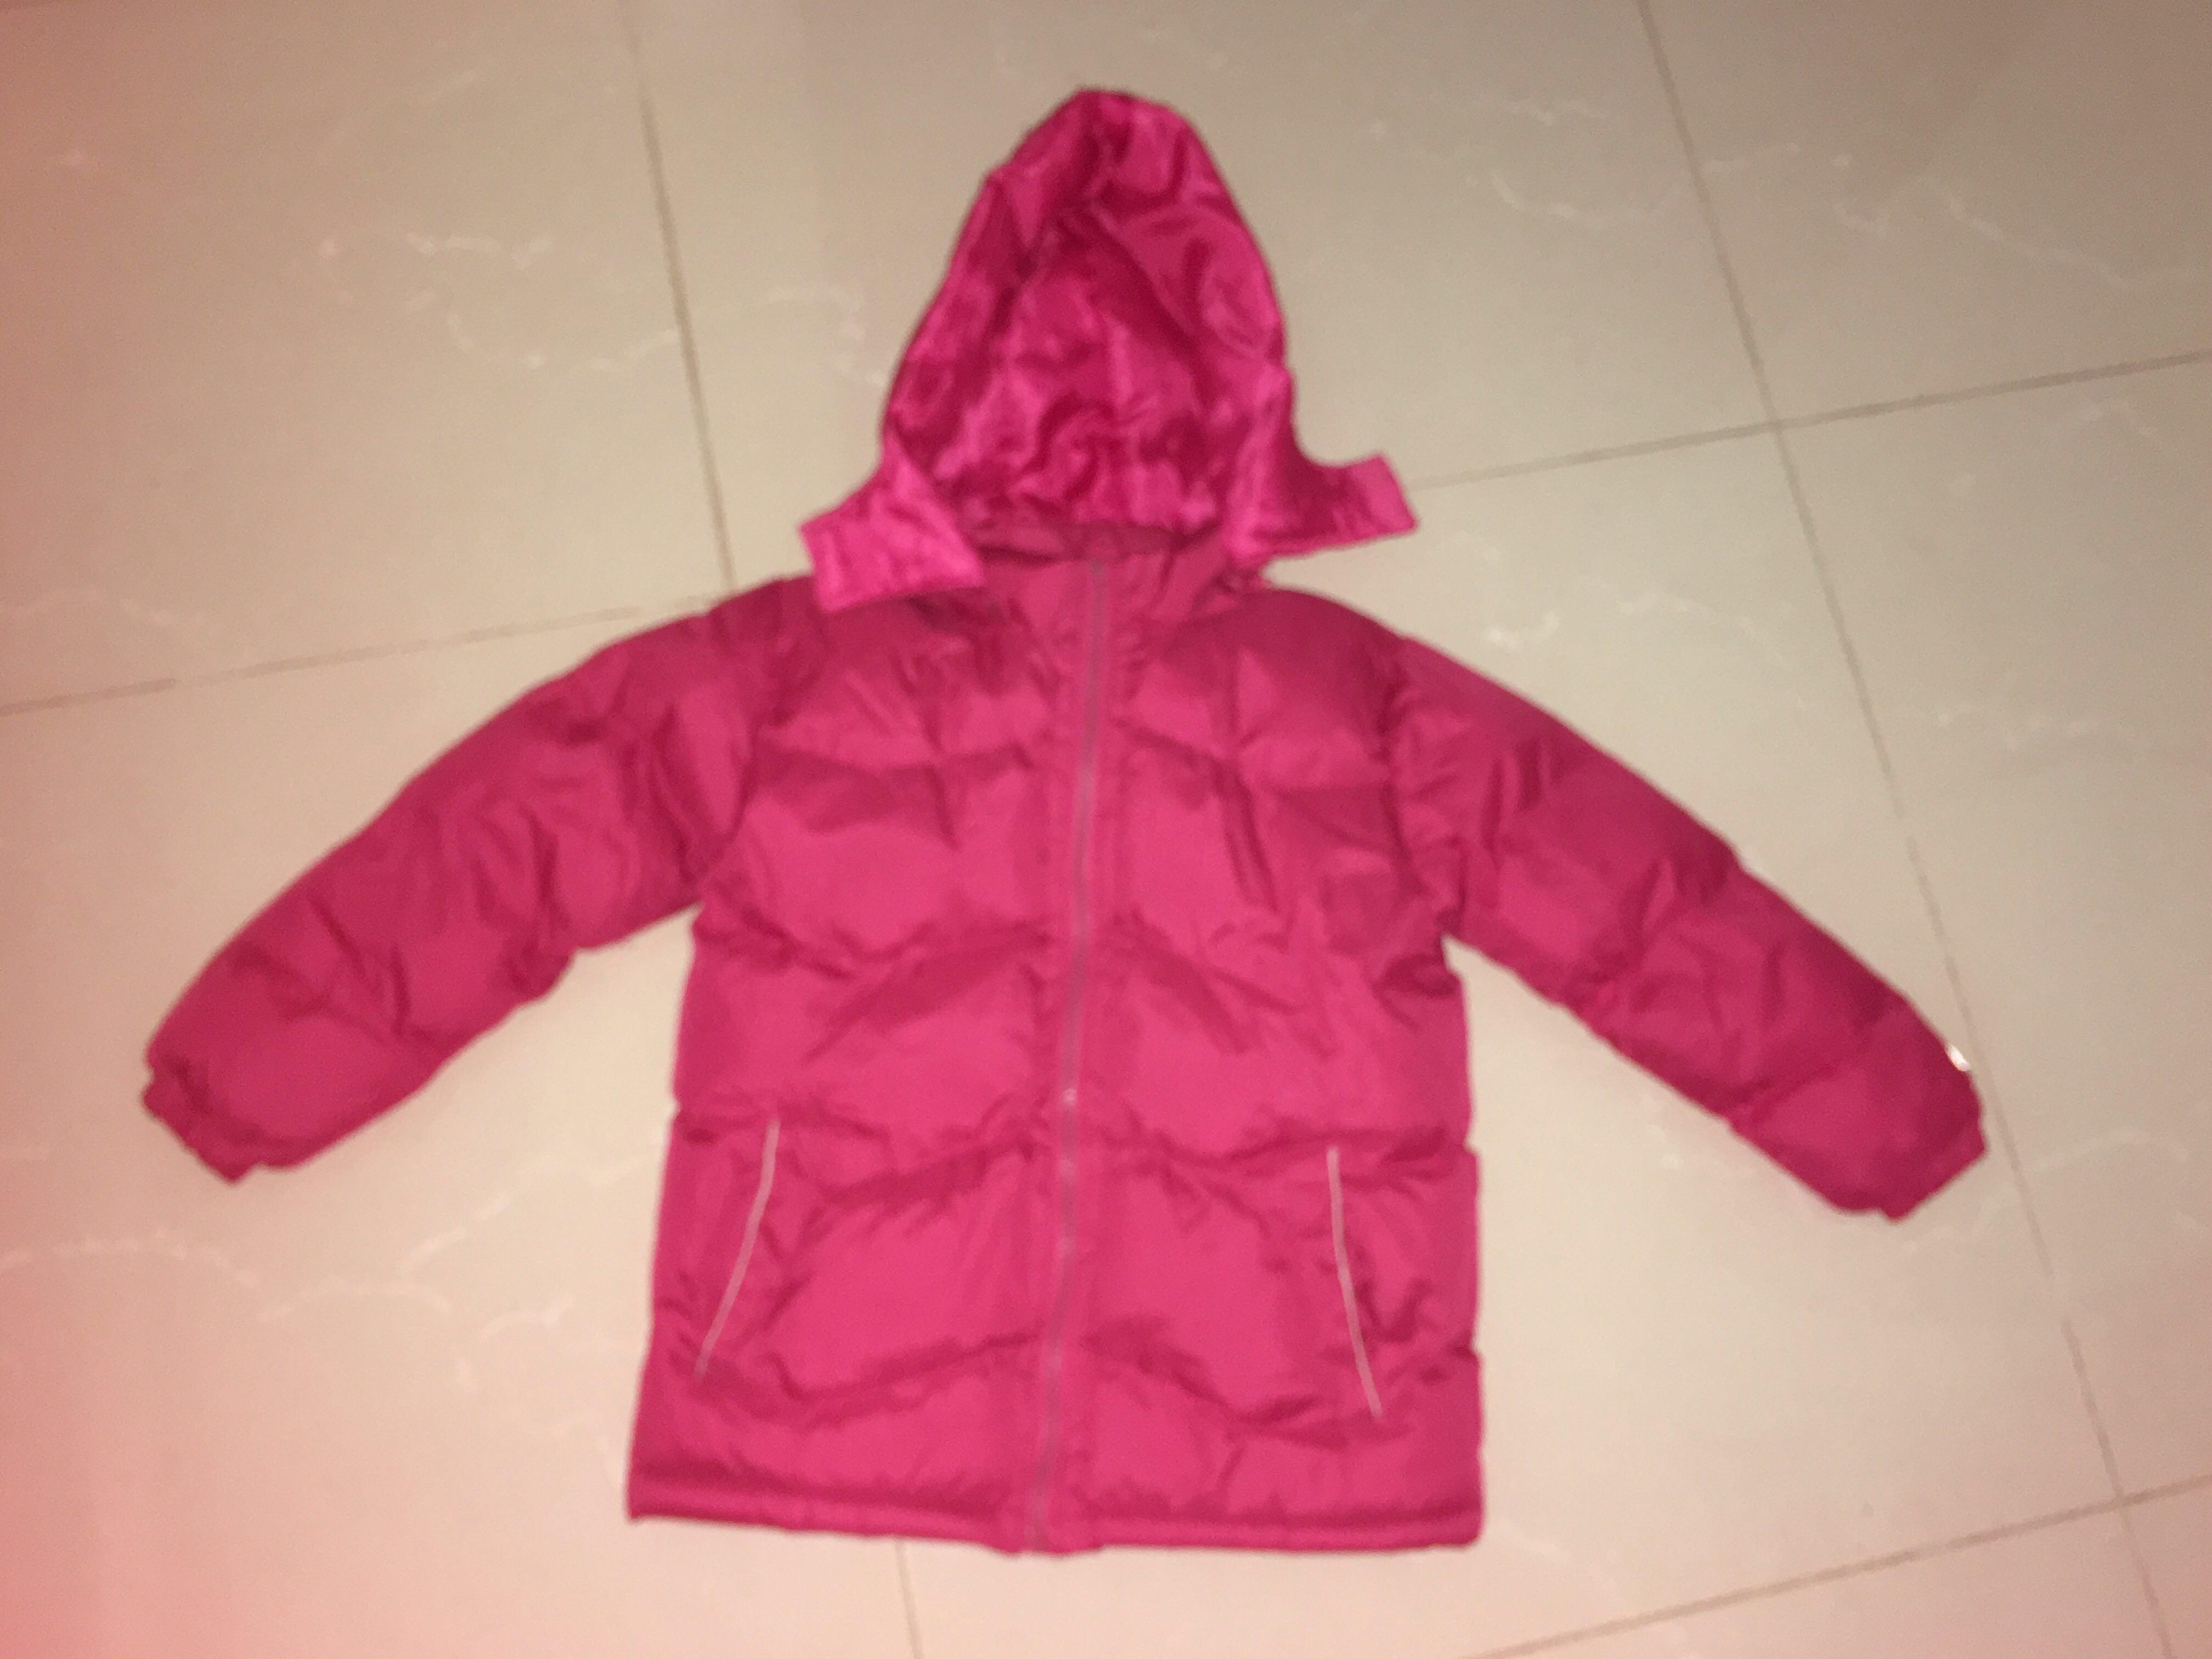 b46097931f76 winter ski jacket very tick for 4 y girl 110 size